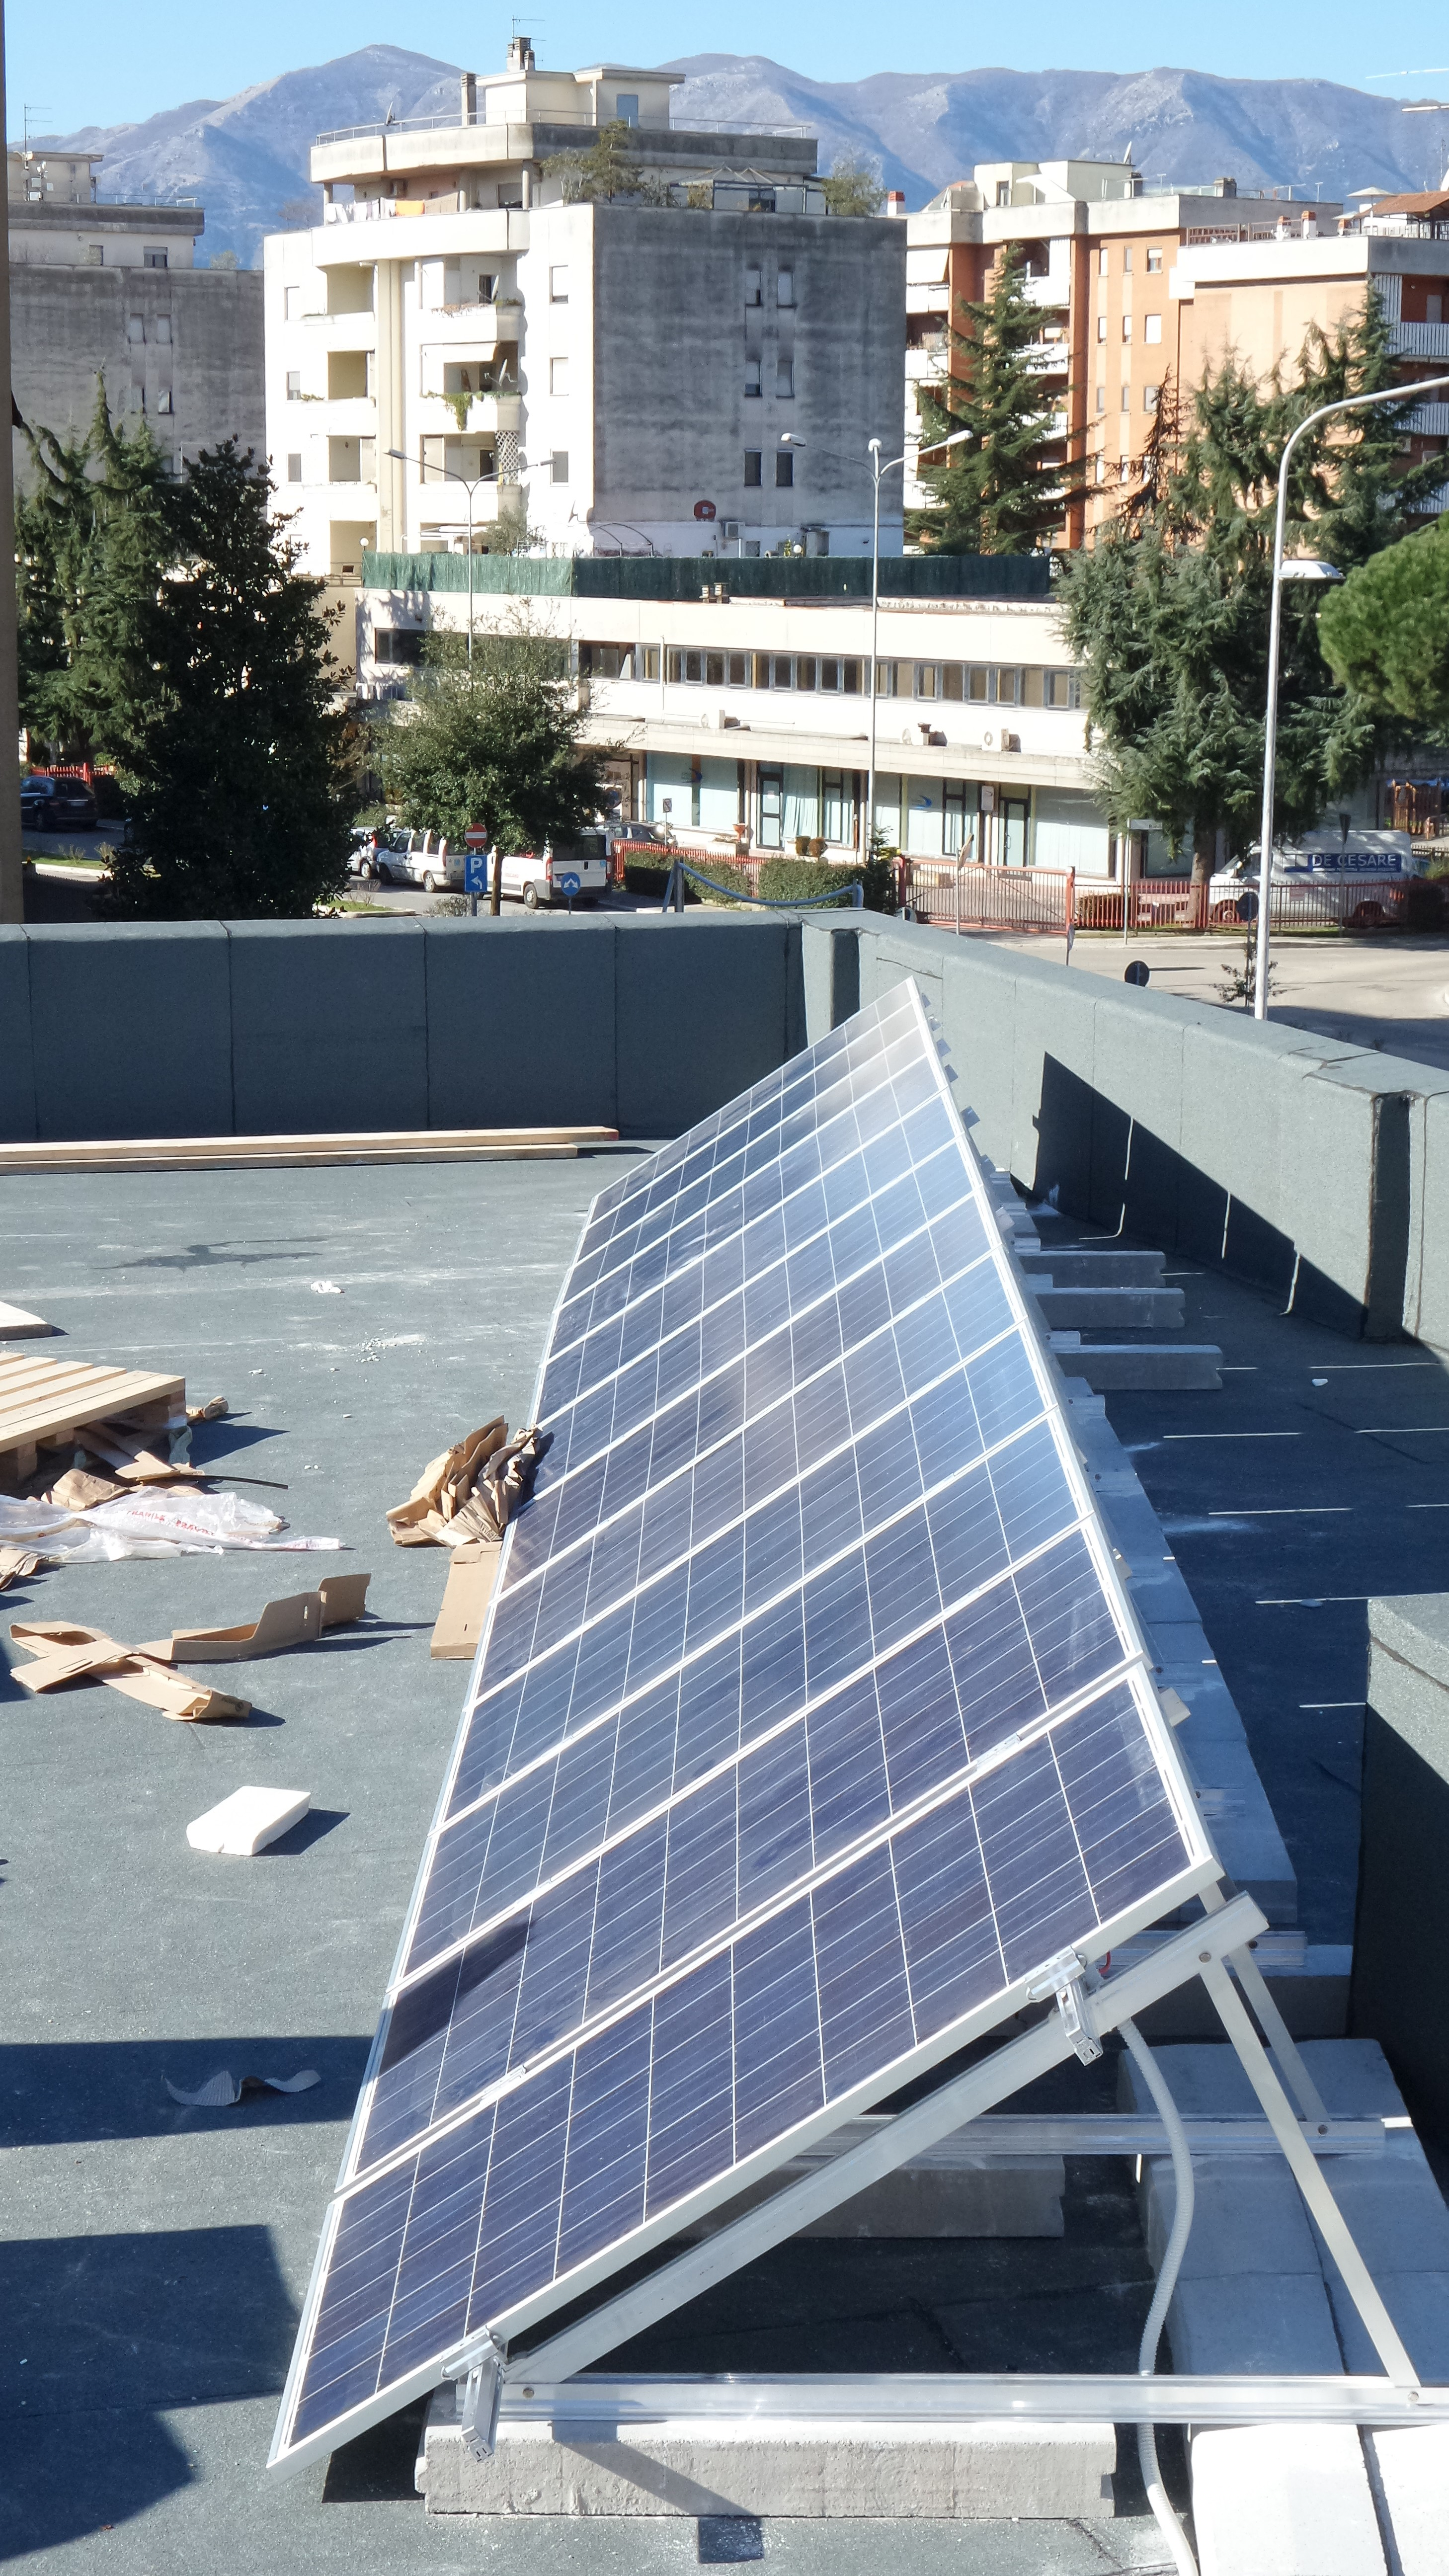 Impianto fotovoltaico Frosinone 6 Kw